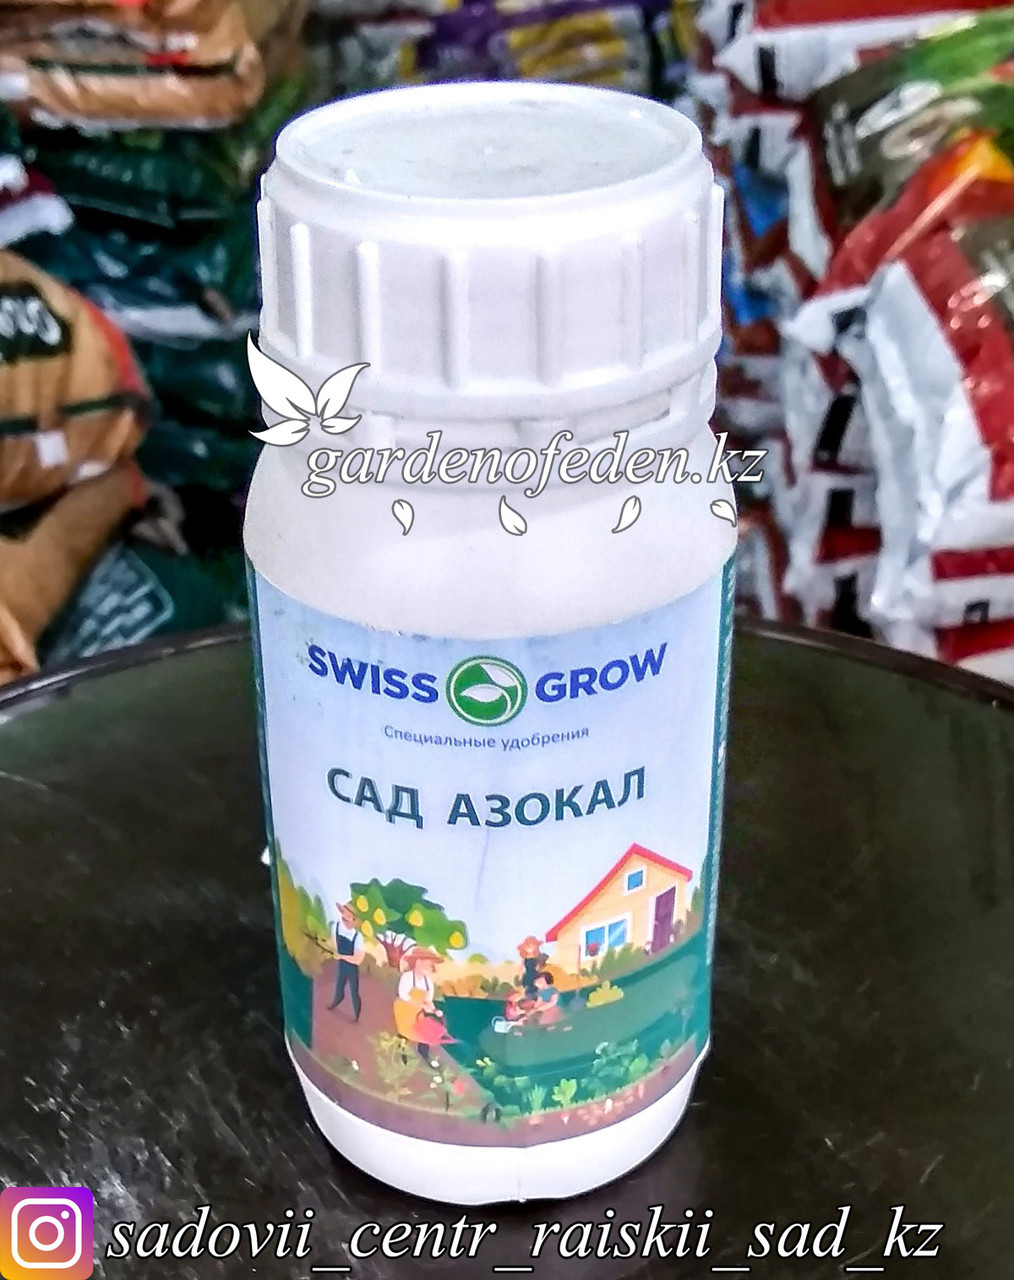 "Жидкие удобрения. Swissgrow ""Сад Азокал"" 250мл."